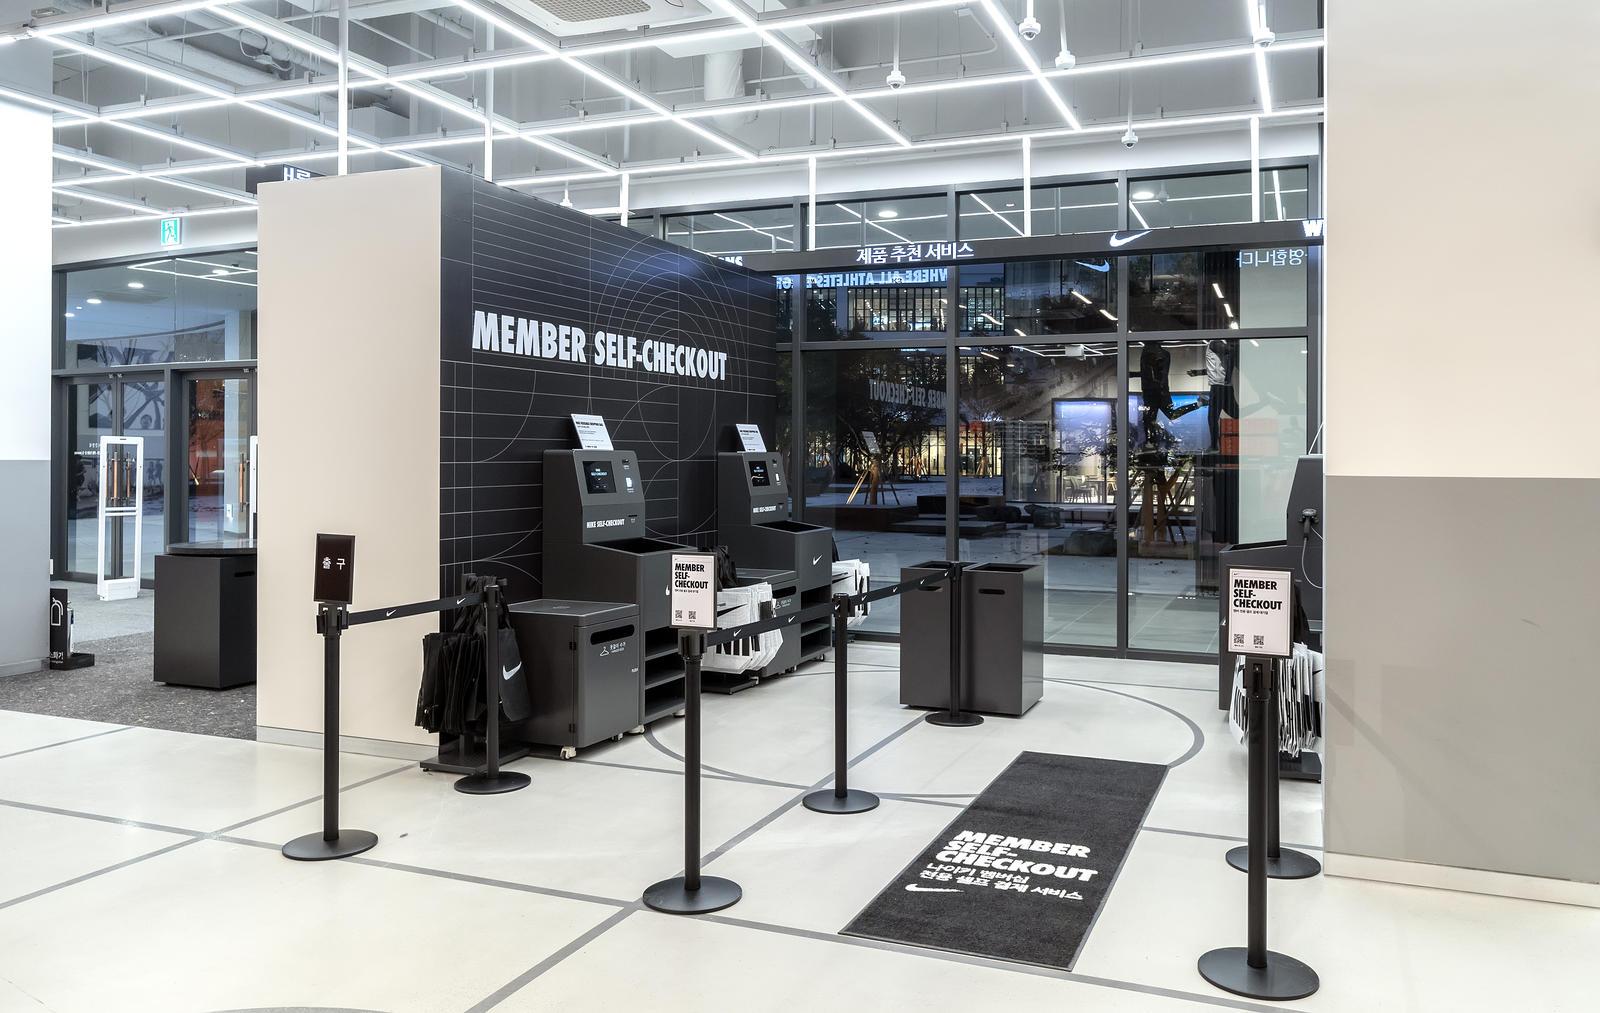 Admirable No puedo leer ni escribir Charles Keasing  Nike Unite Retail Concept - Nike News